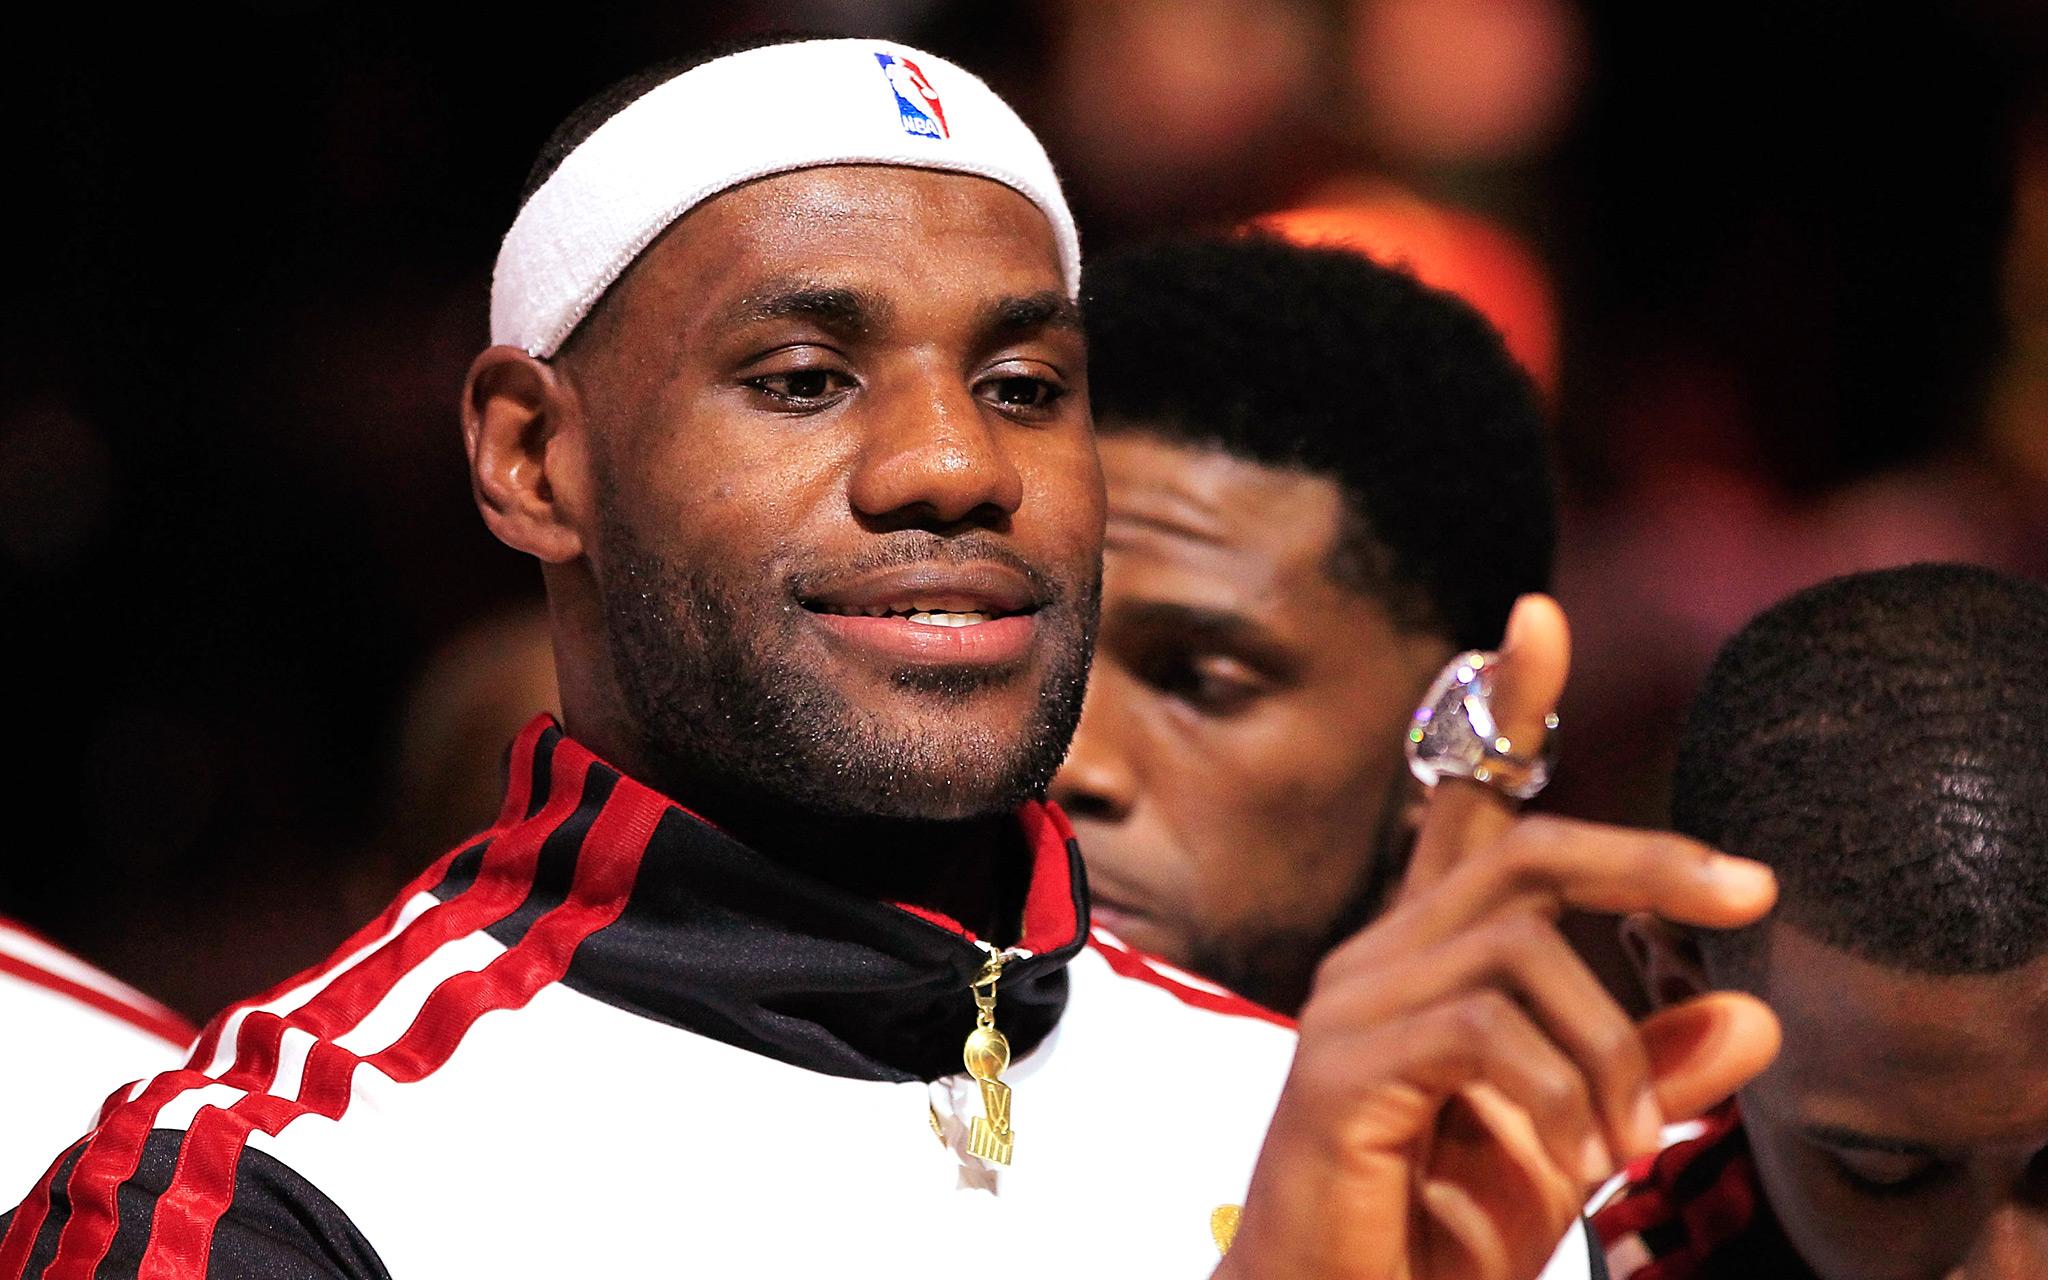 Who Many Rings Does Michael Jordan